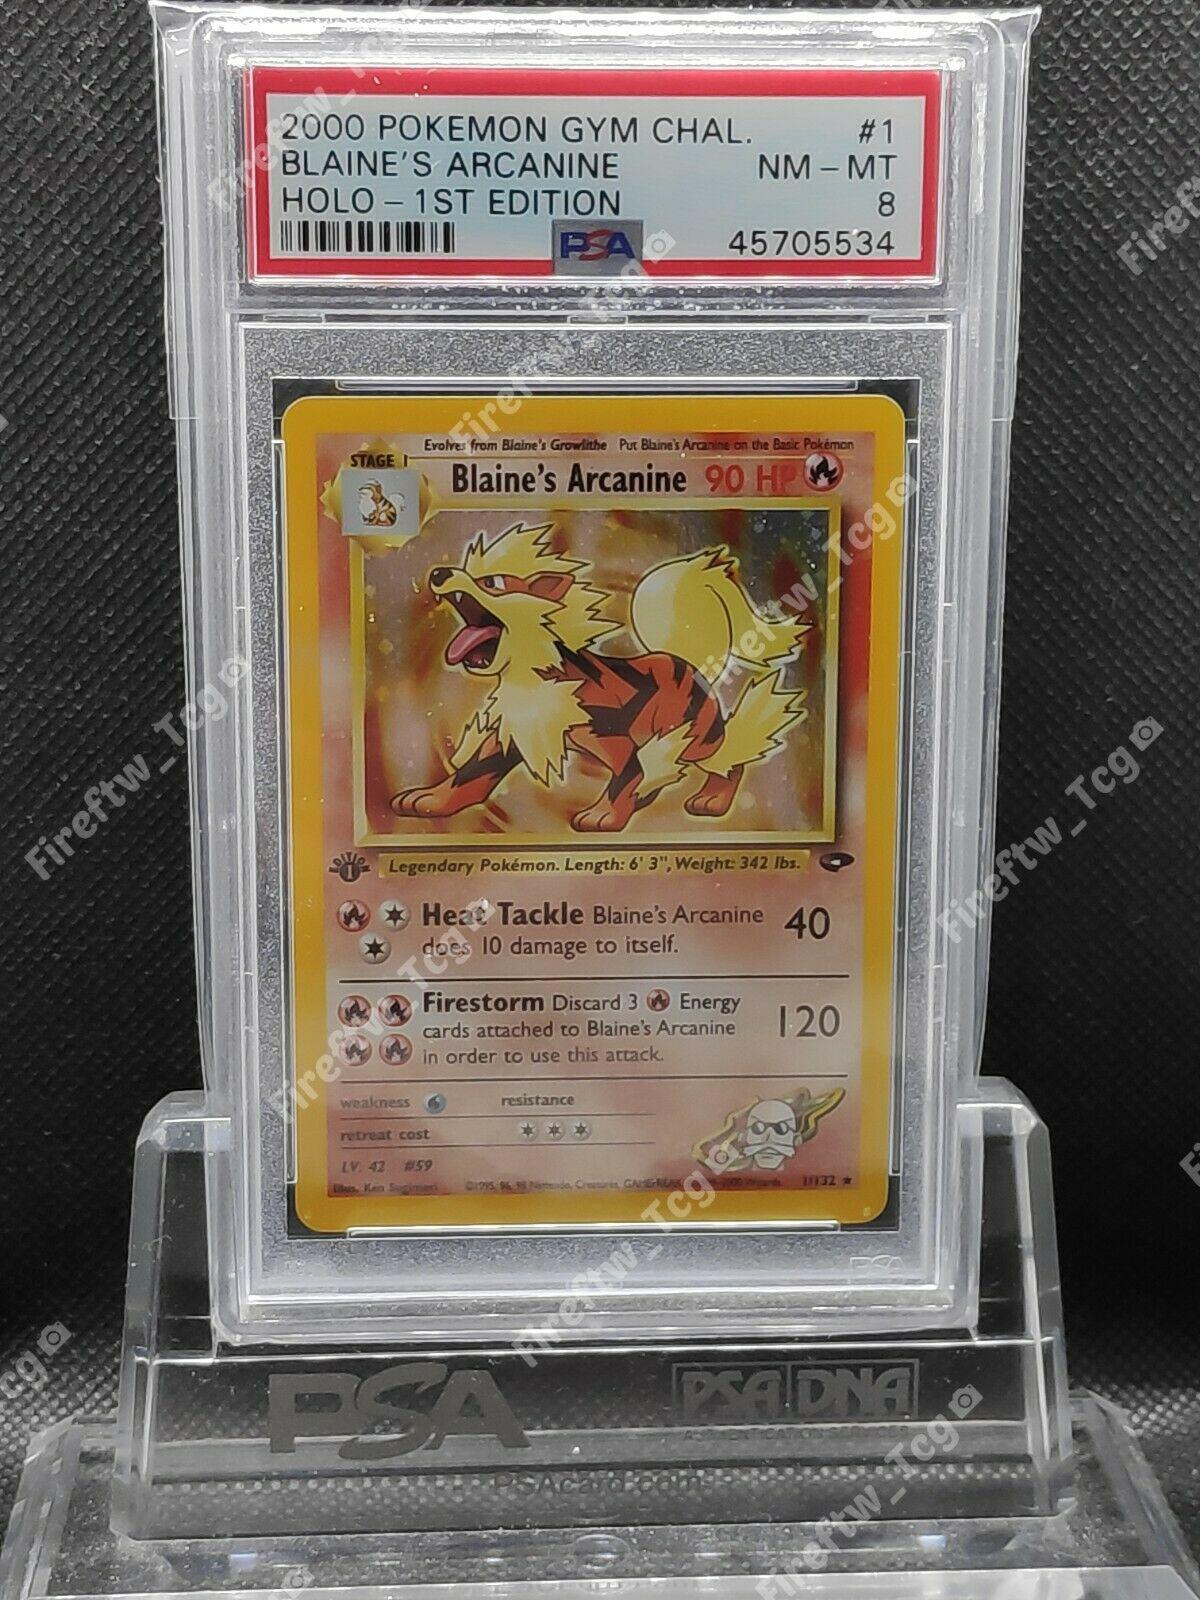 Pokemon Card Gym Challenge 1st Edition PSA 8 MINT Blaines Arcanine Holo 1132